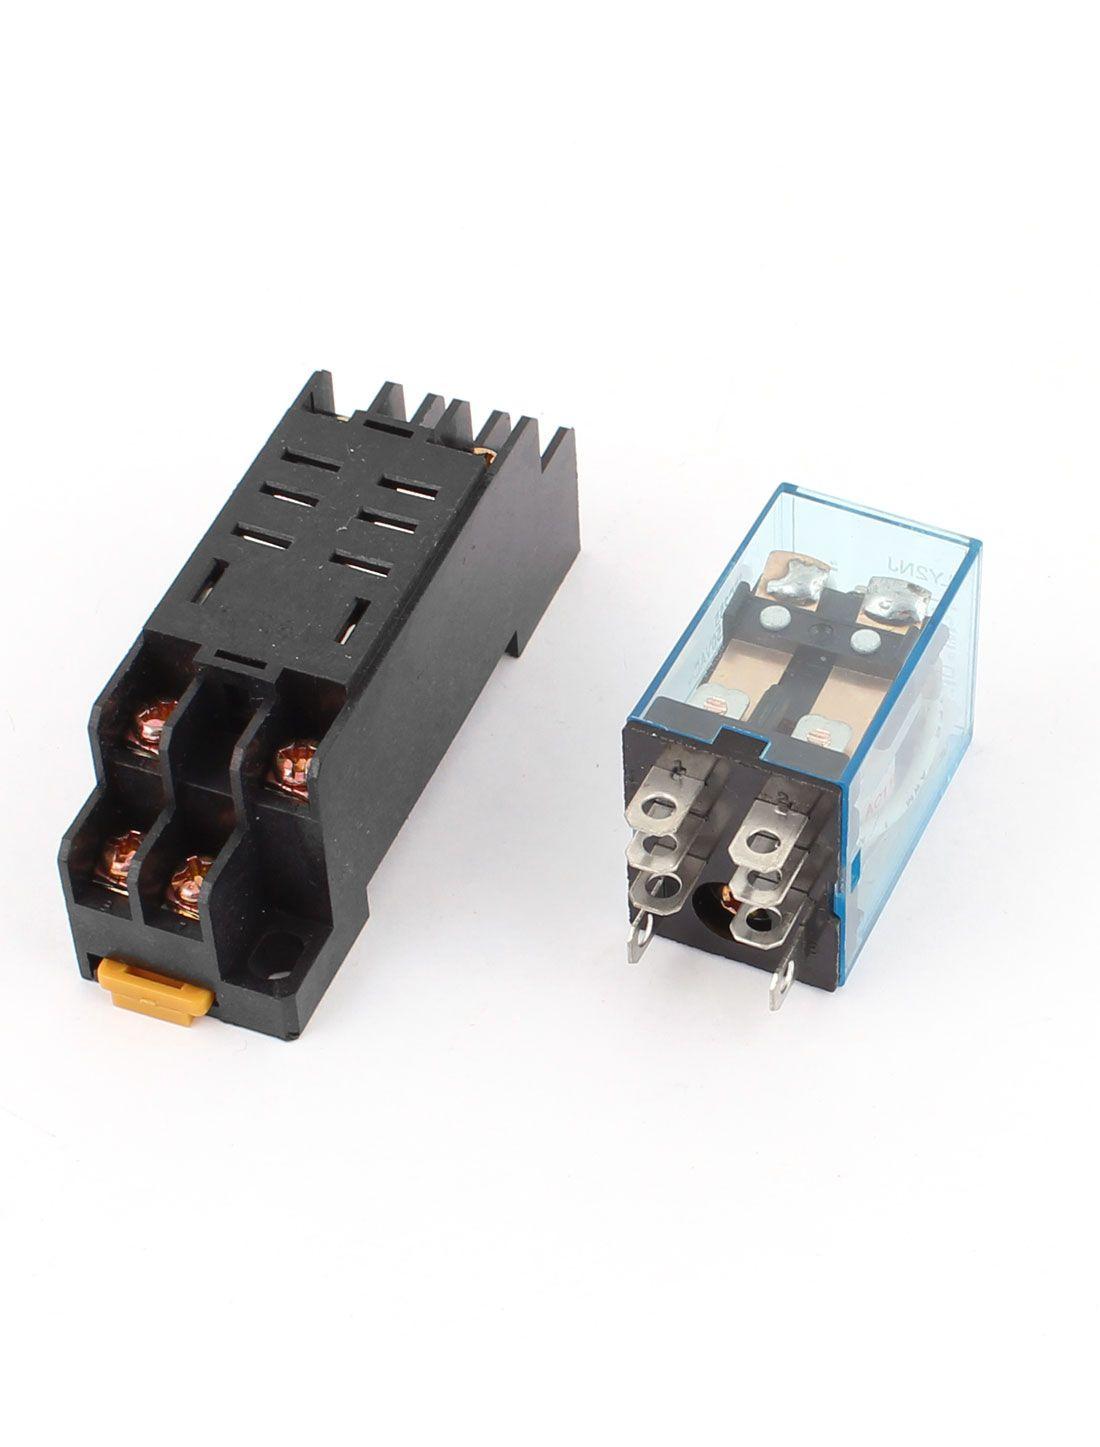 12V DC Coil Power Relay DPDT LY2NJ HH62P-L JQX-13F NEW With PTF08A Socket Base